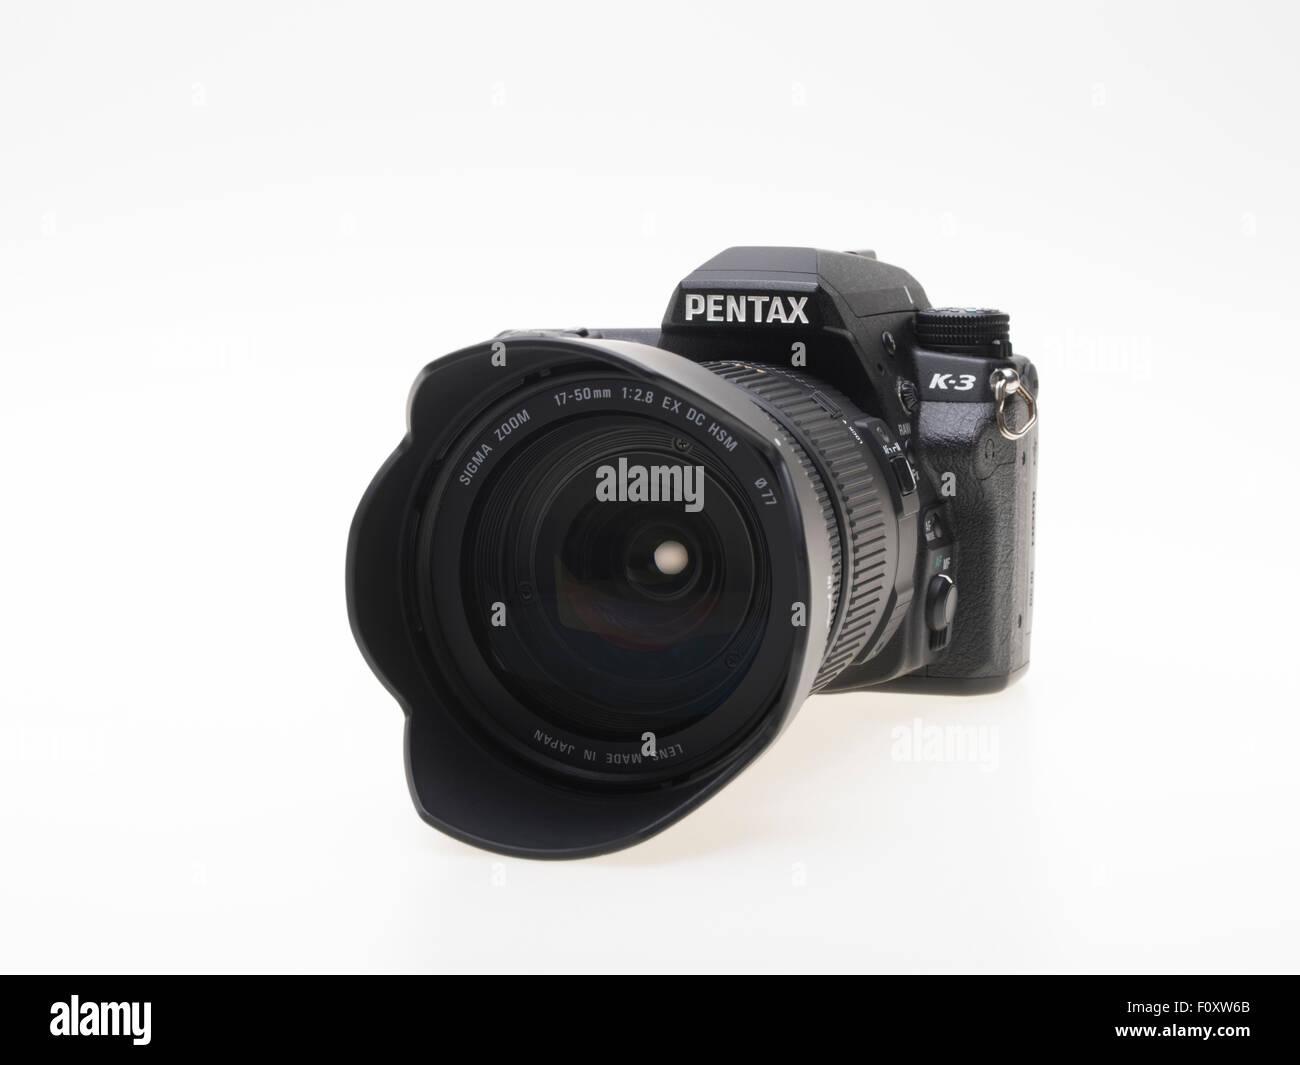 Pentax K3 DSLR camera with Sigma 17-50 f2.8 zoom lens - Stock Image